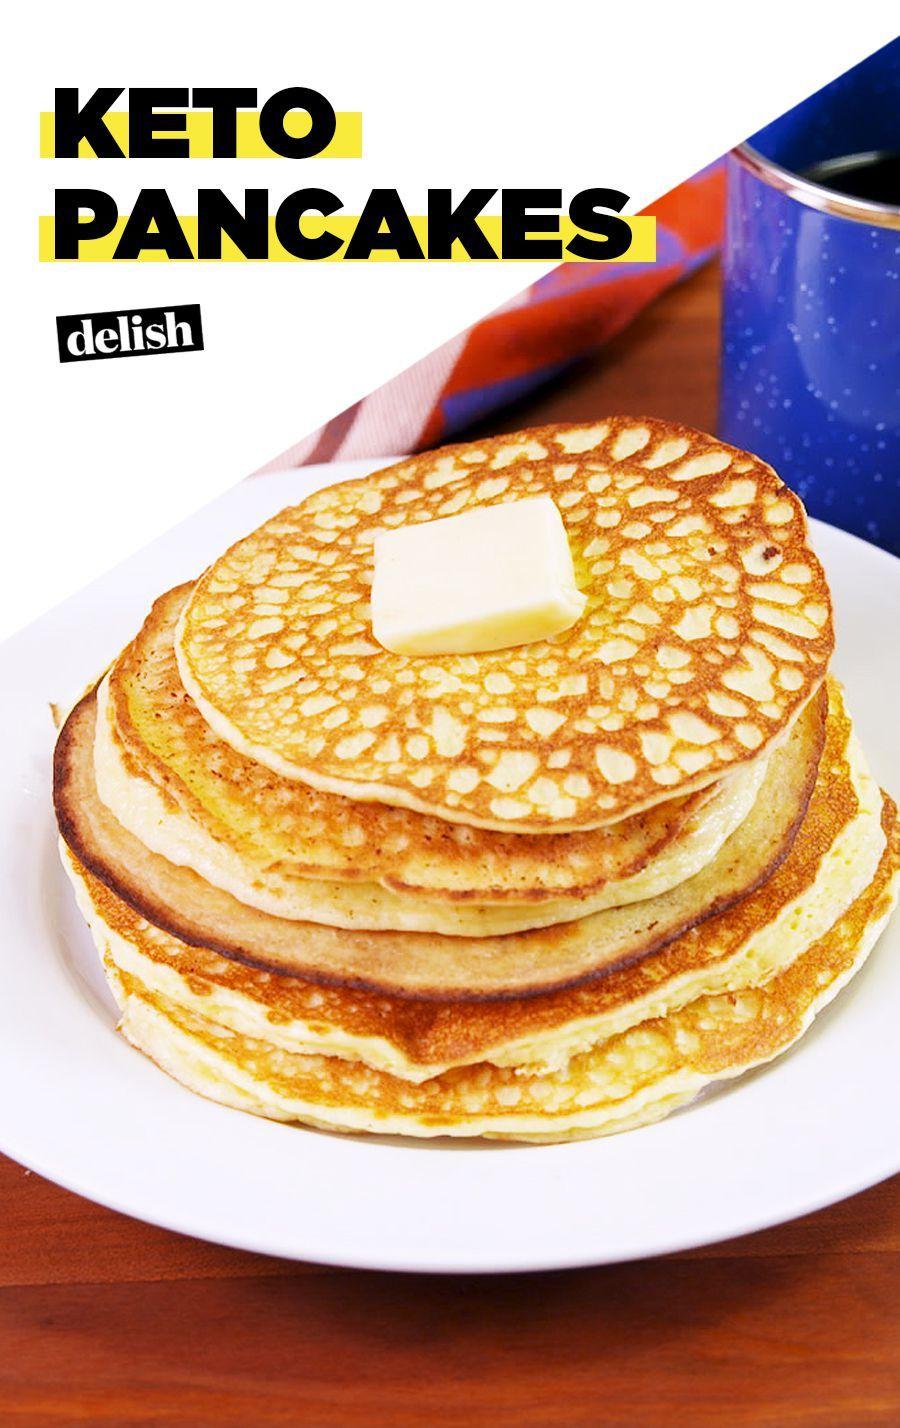 Keto Pancakes Recipe Keto Recipes Easy